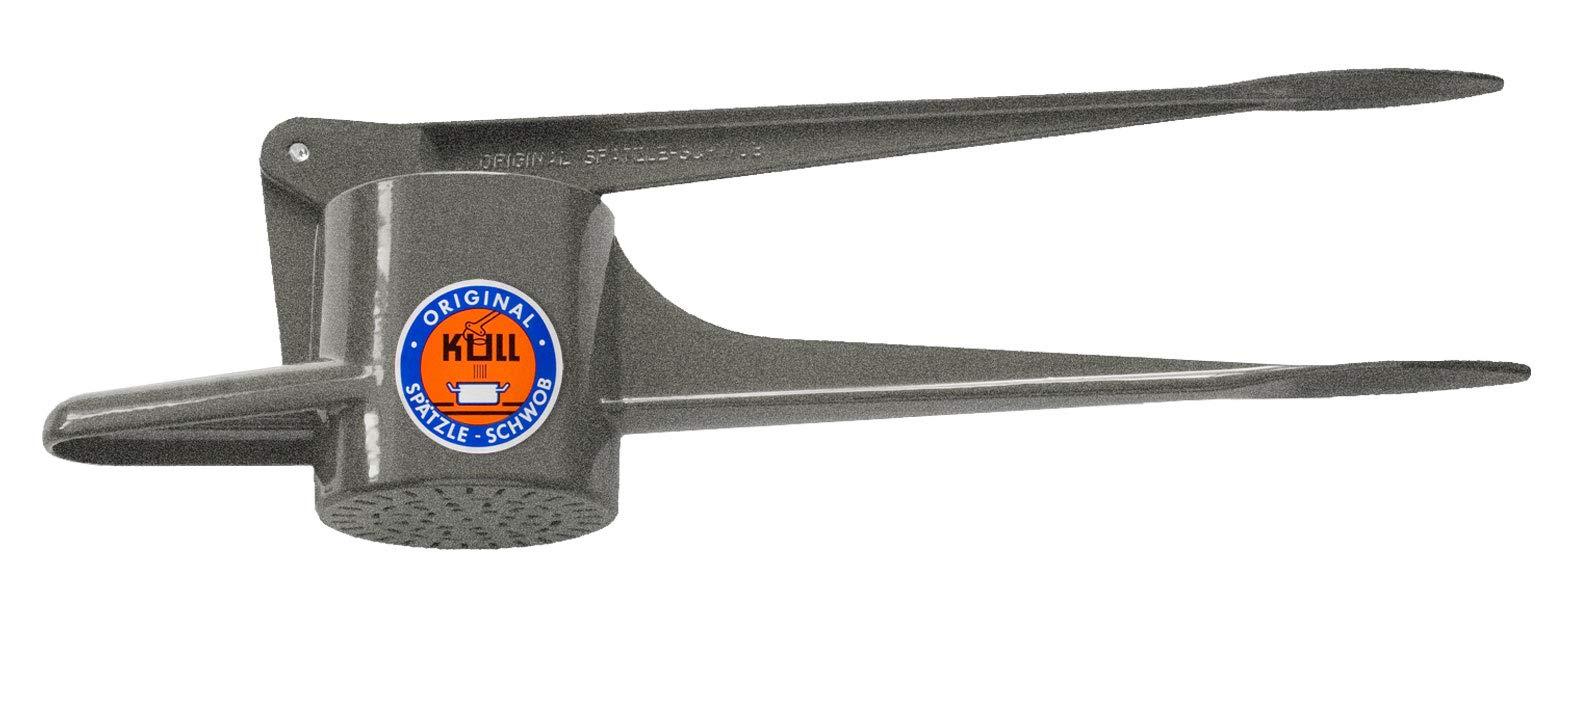 Original Kull Spaetzle-Schwob GRANITE, Spaetzle Press / Spaetzle Maker - suitable for dishwasher! PREPARE OWN PASTA / NOODLES IN A FEW MINUTES! Incl. Spaetzle Recipe! Also POTATO RICER! by B-Bonnie